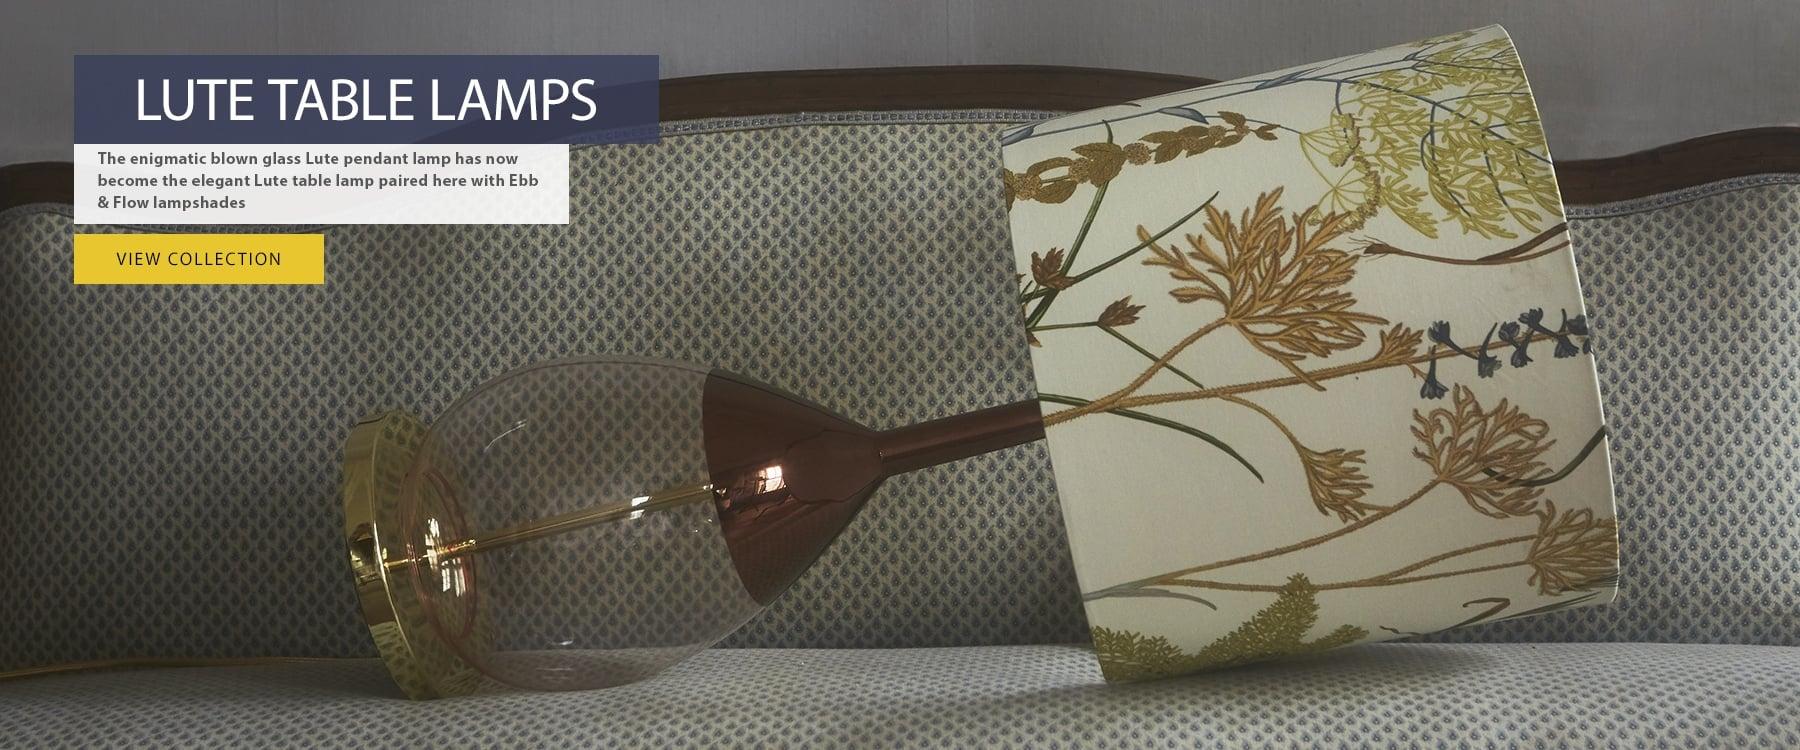 Ebb & Flow Lute Table Lamp